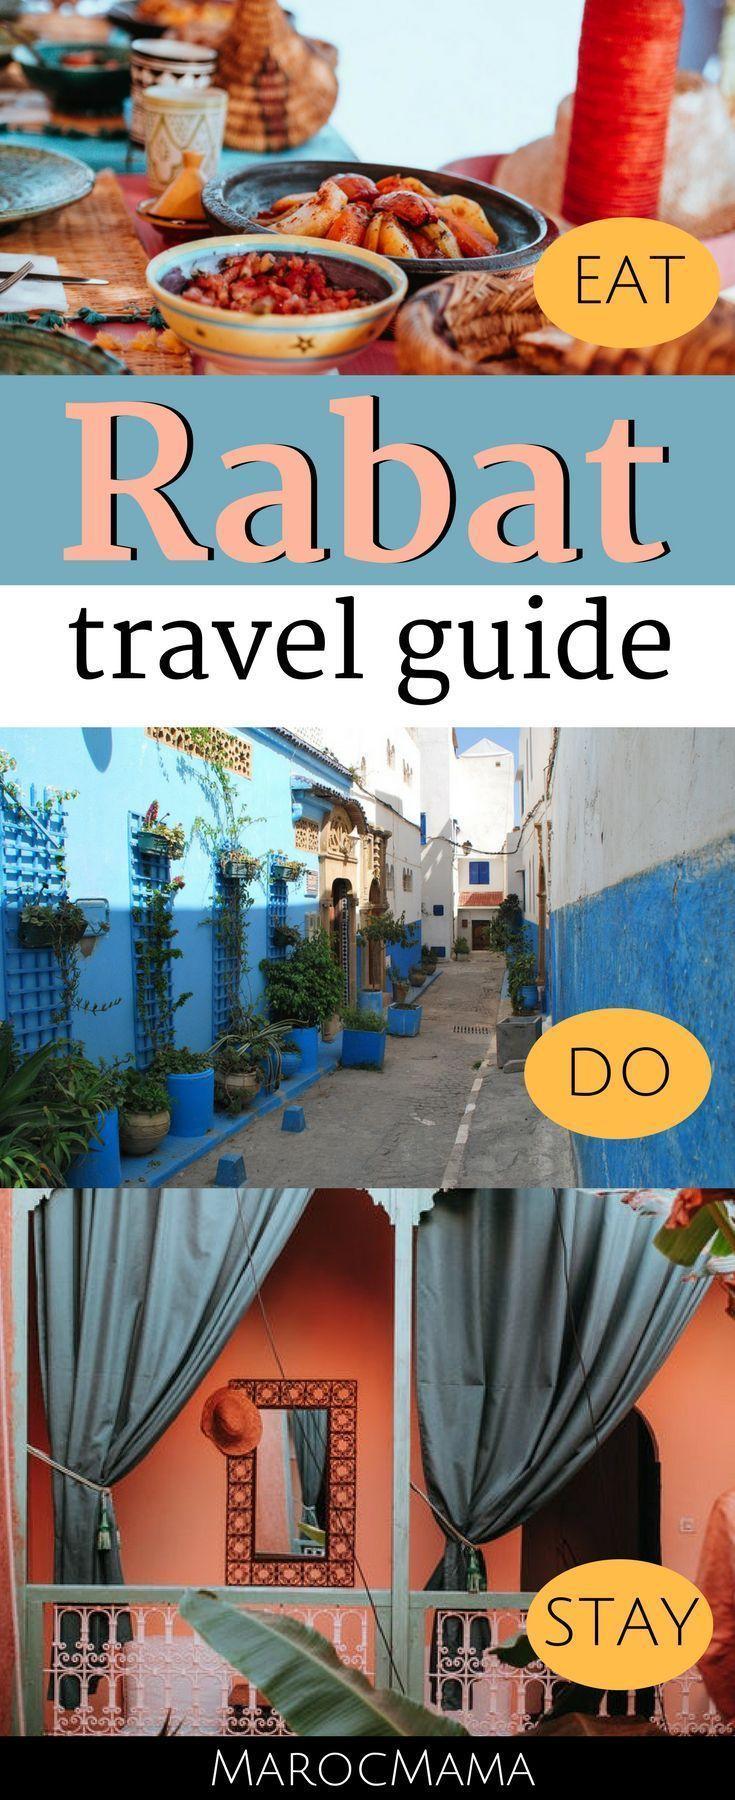 Rabat The Capital Of Morocco Is Often Left Off Tourist Maps But There Is Plenty Travel And Tourism Trends 2019 Marokko Urlaub Marokko Rundreise Marokko